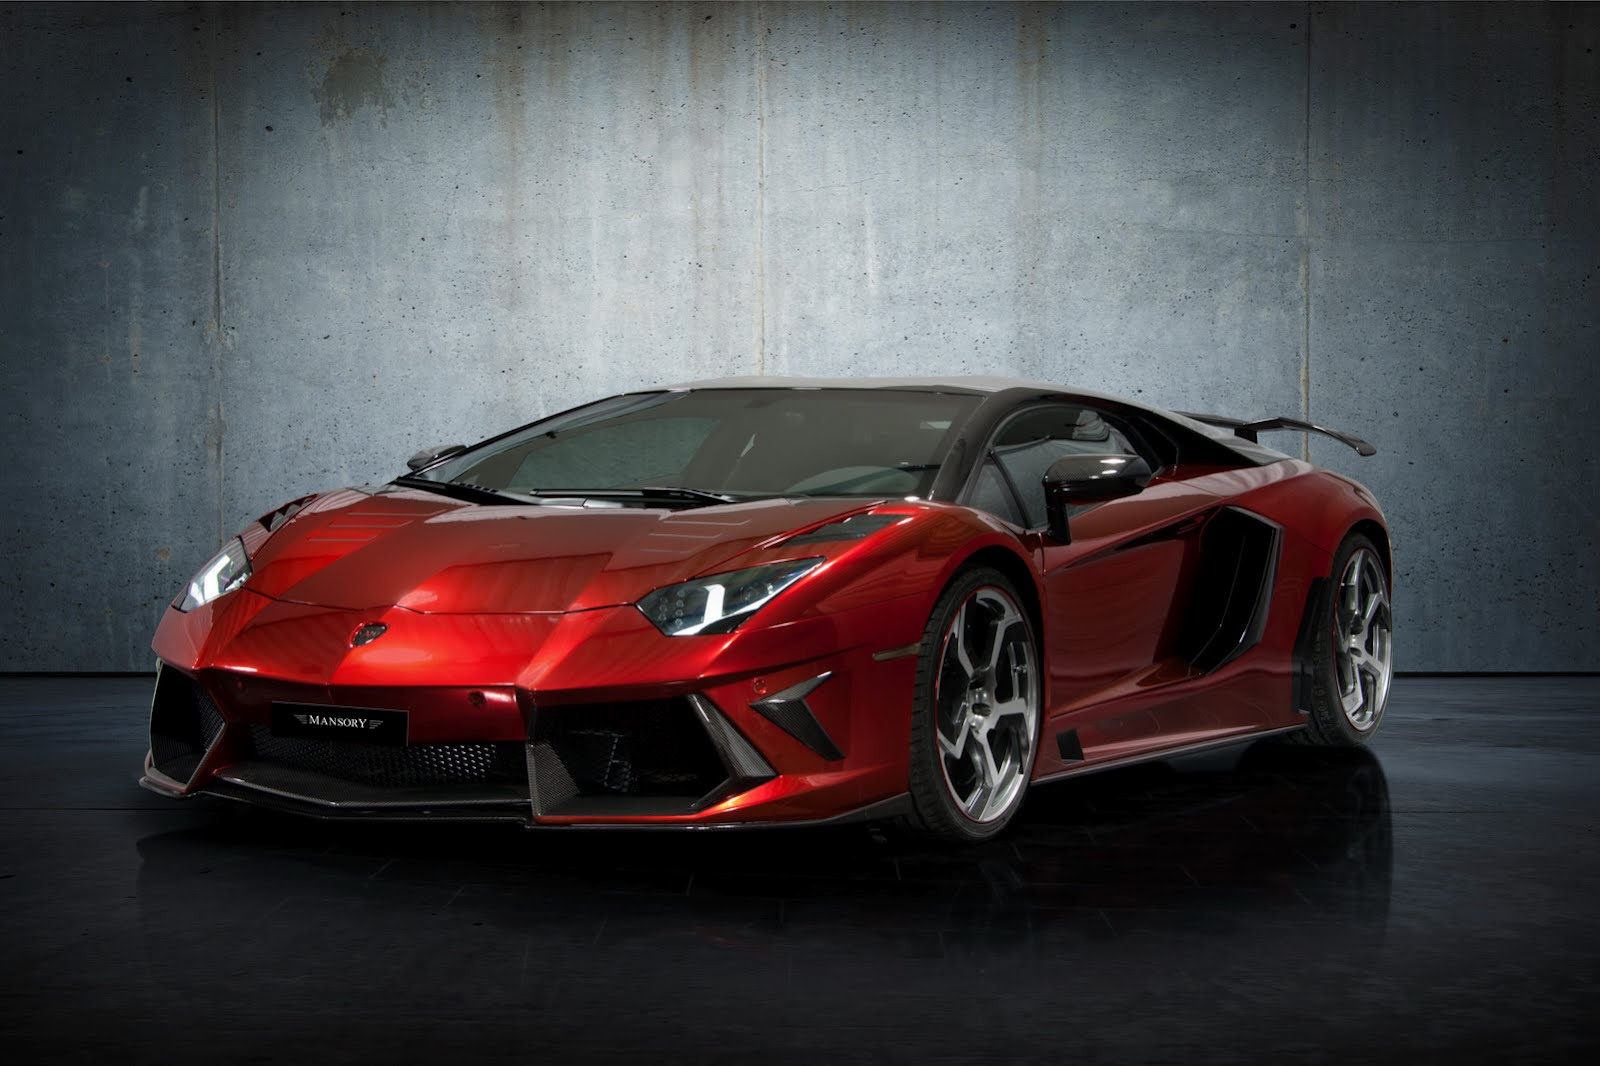 Lamborghini Aventador LP700-4 by Mansory